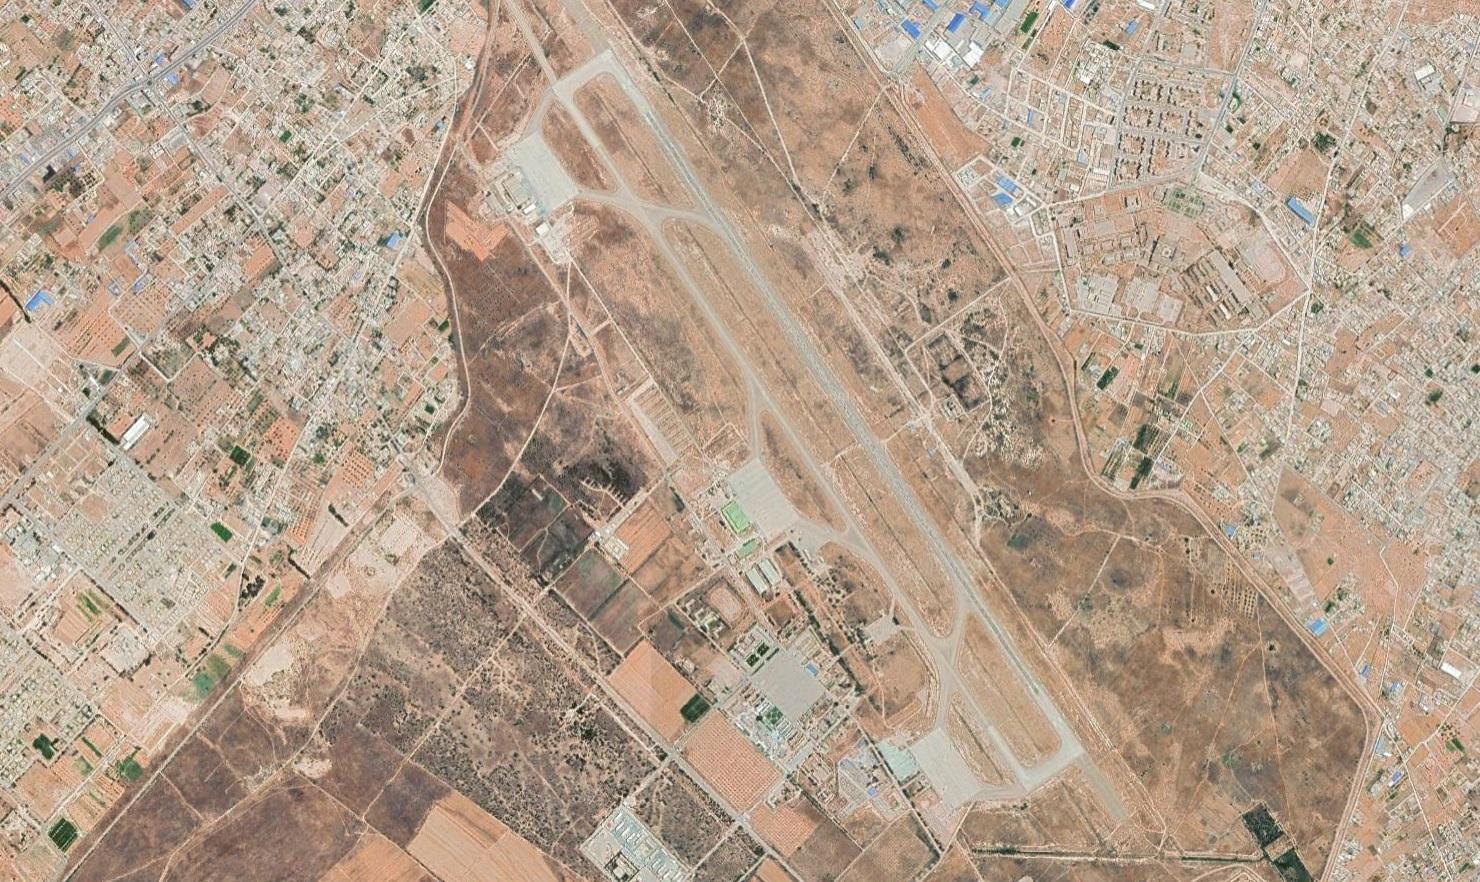 Libyan Air Force Destroys Cargo Plane, Warplane & Radars In Misrata Airbase (Video)